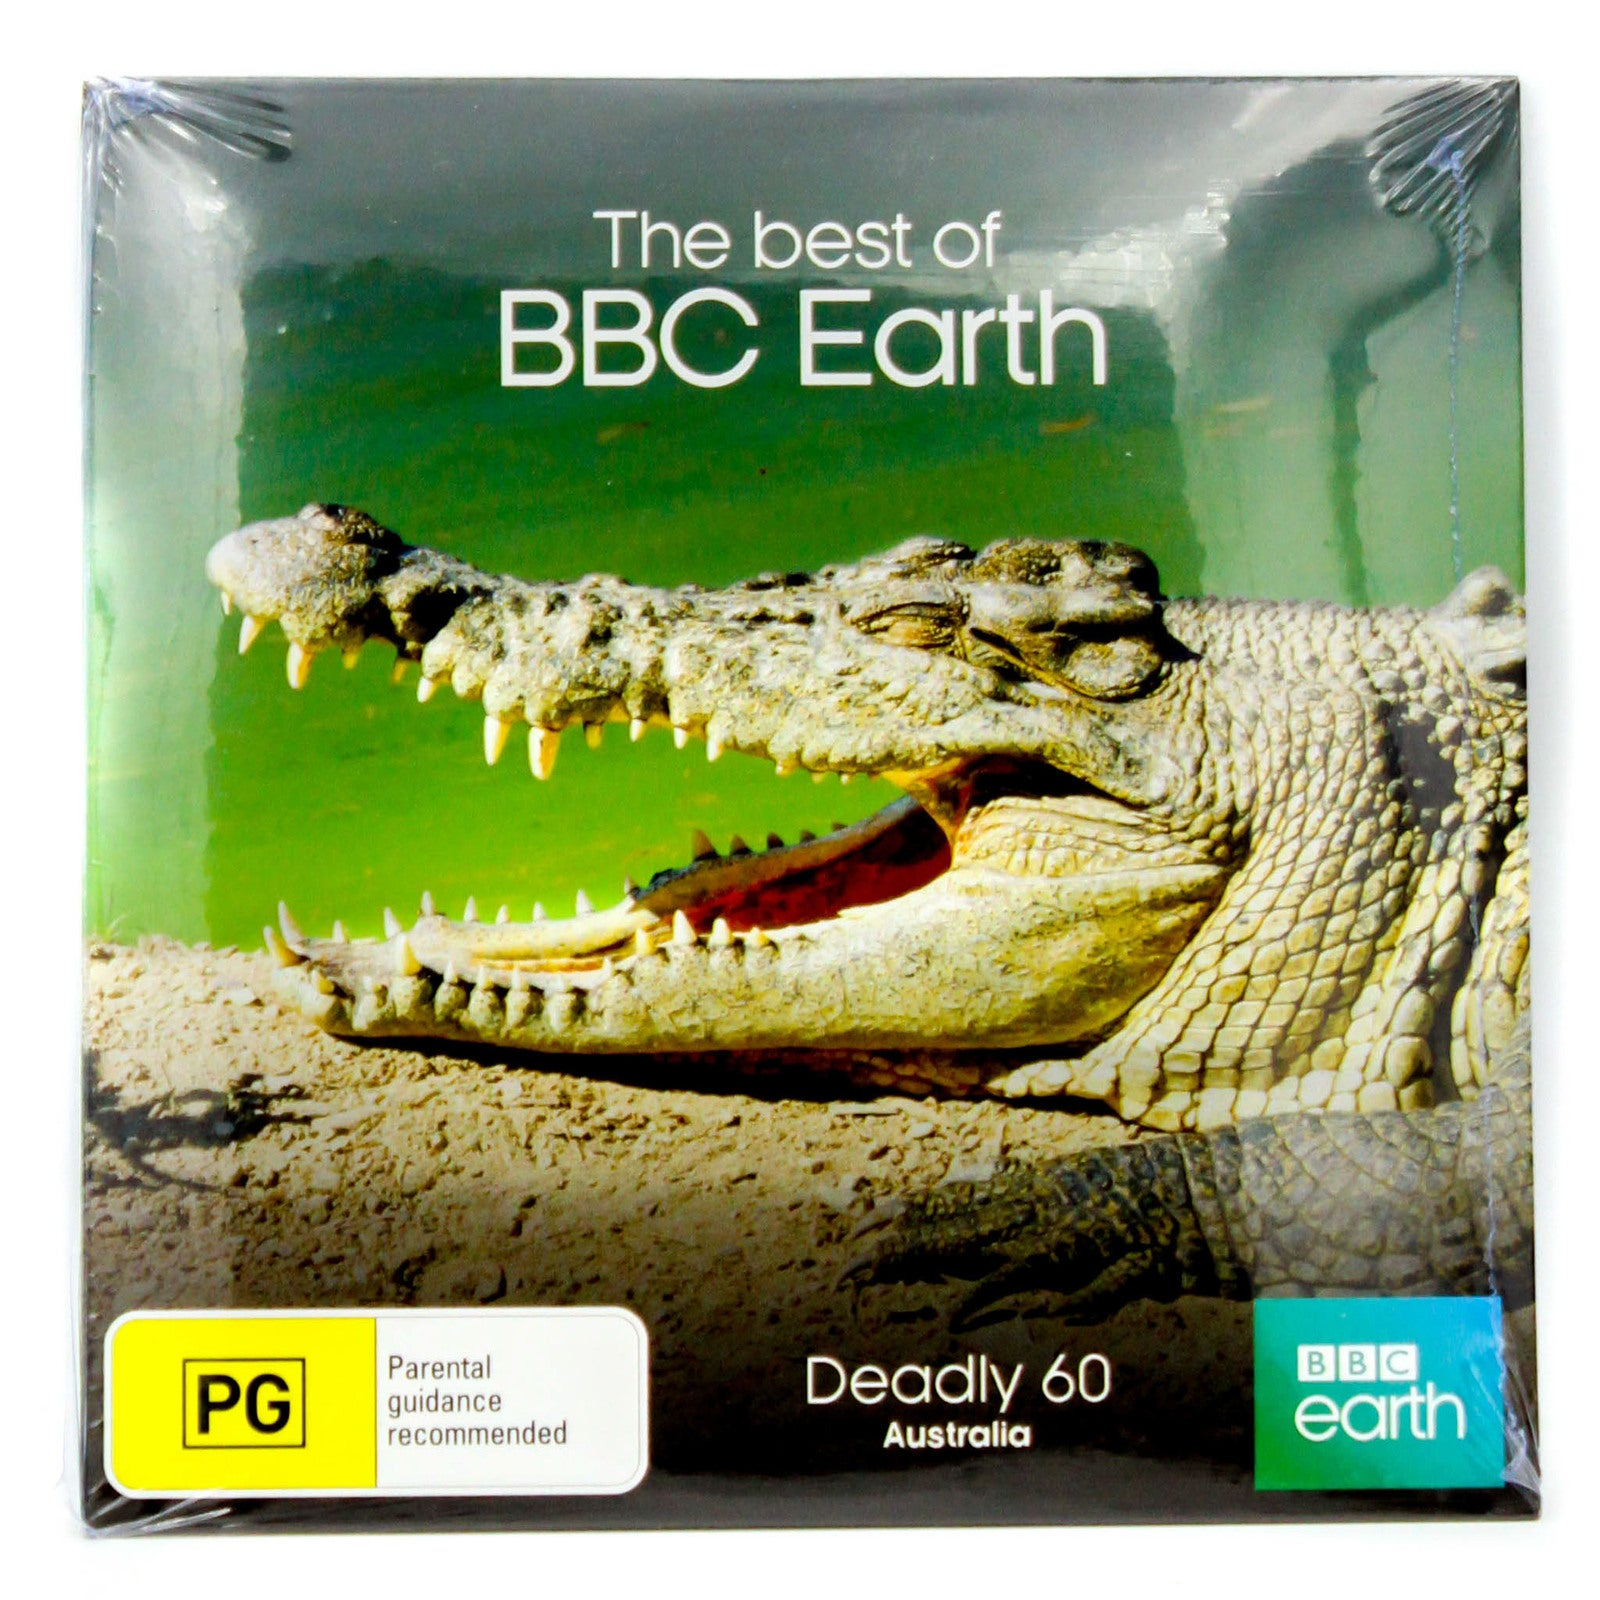 Deadly 60 Australia-BBC Earth-Slip Case - DVD Series Rare Aus Stock New